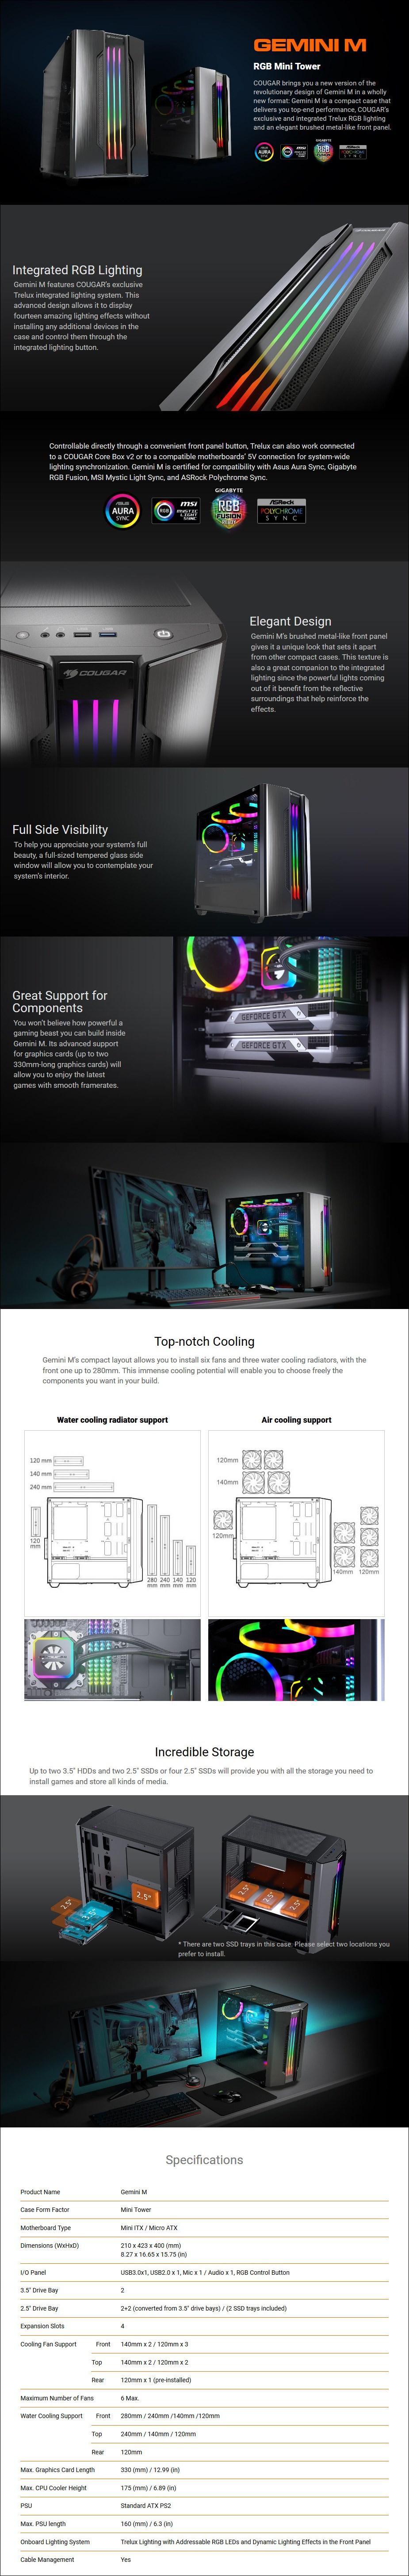 Cougar Gemini M RGB Tempered Glass Micro-ATX Case - Overview 1